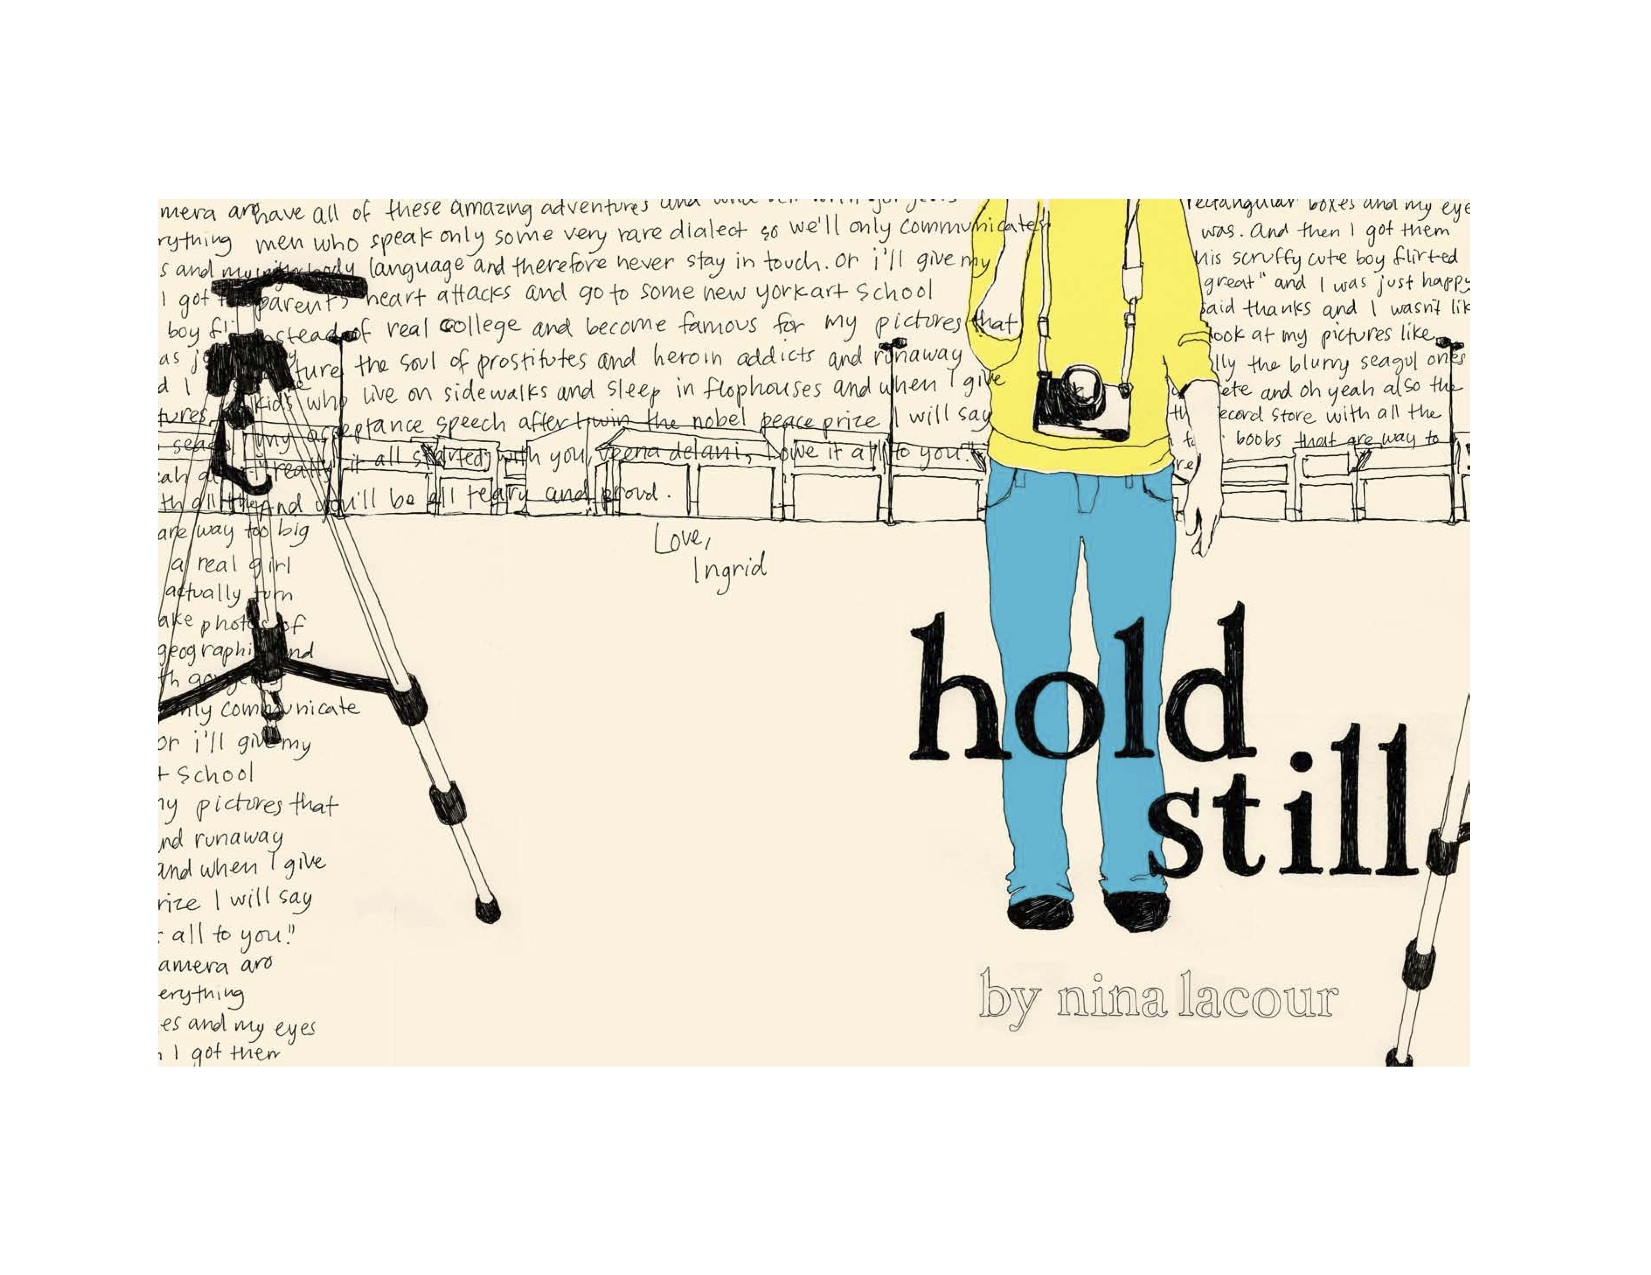 hold still nina lacour pdf